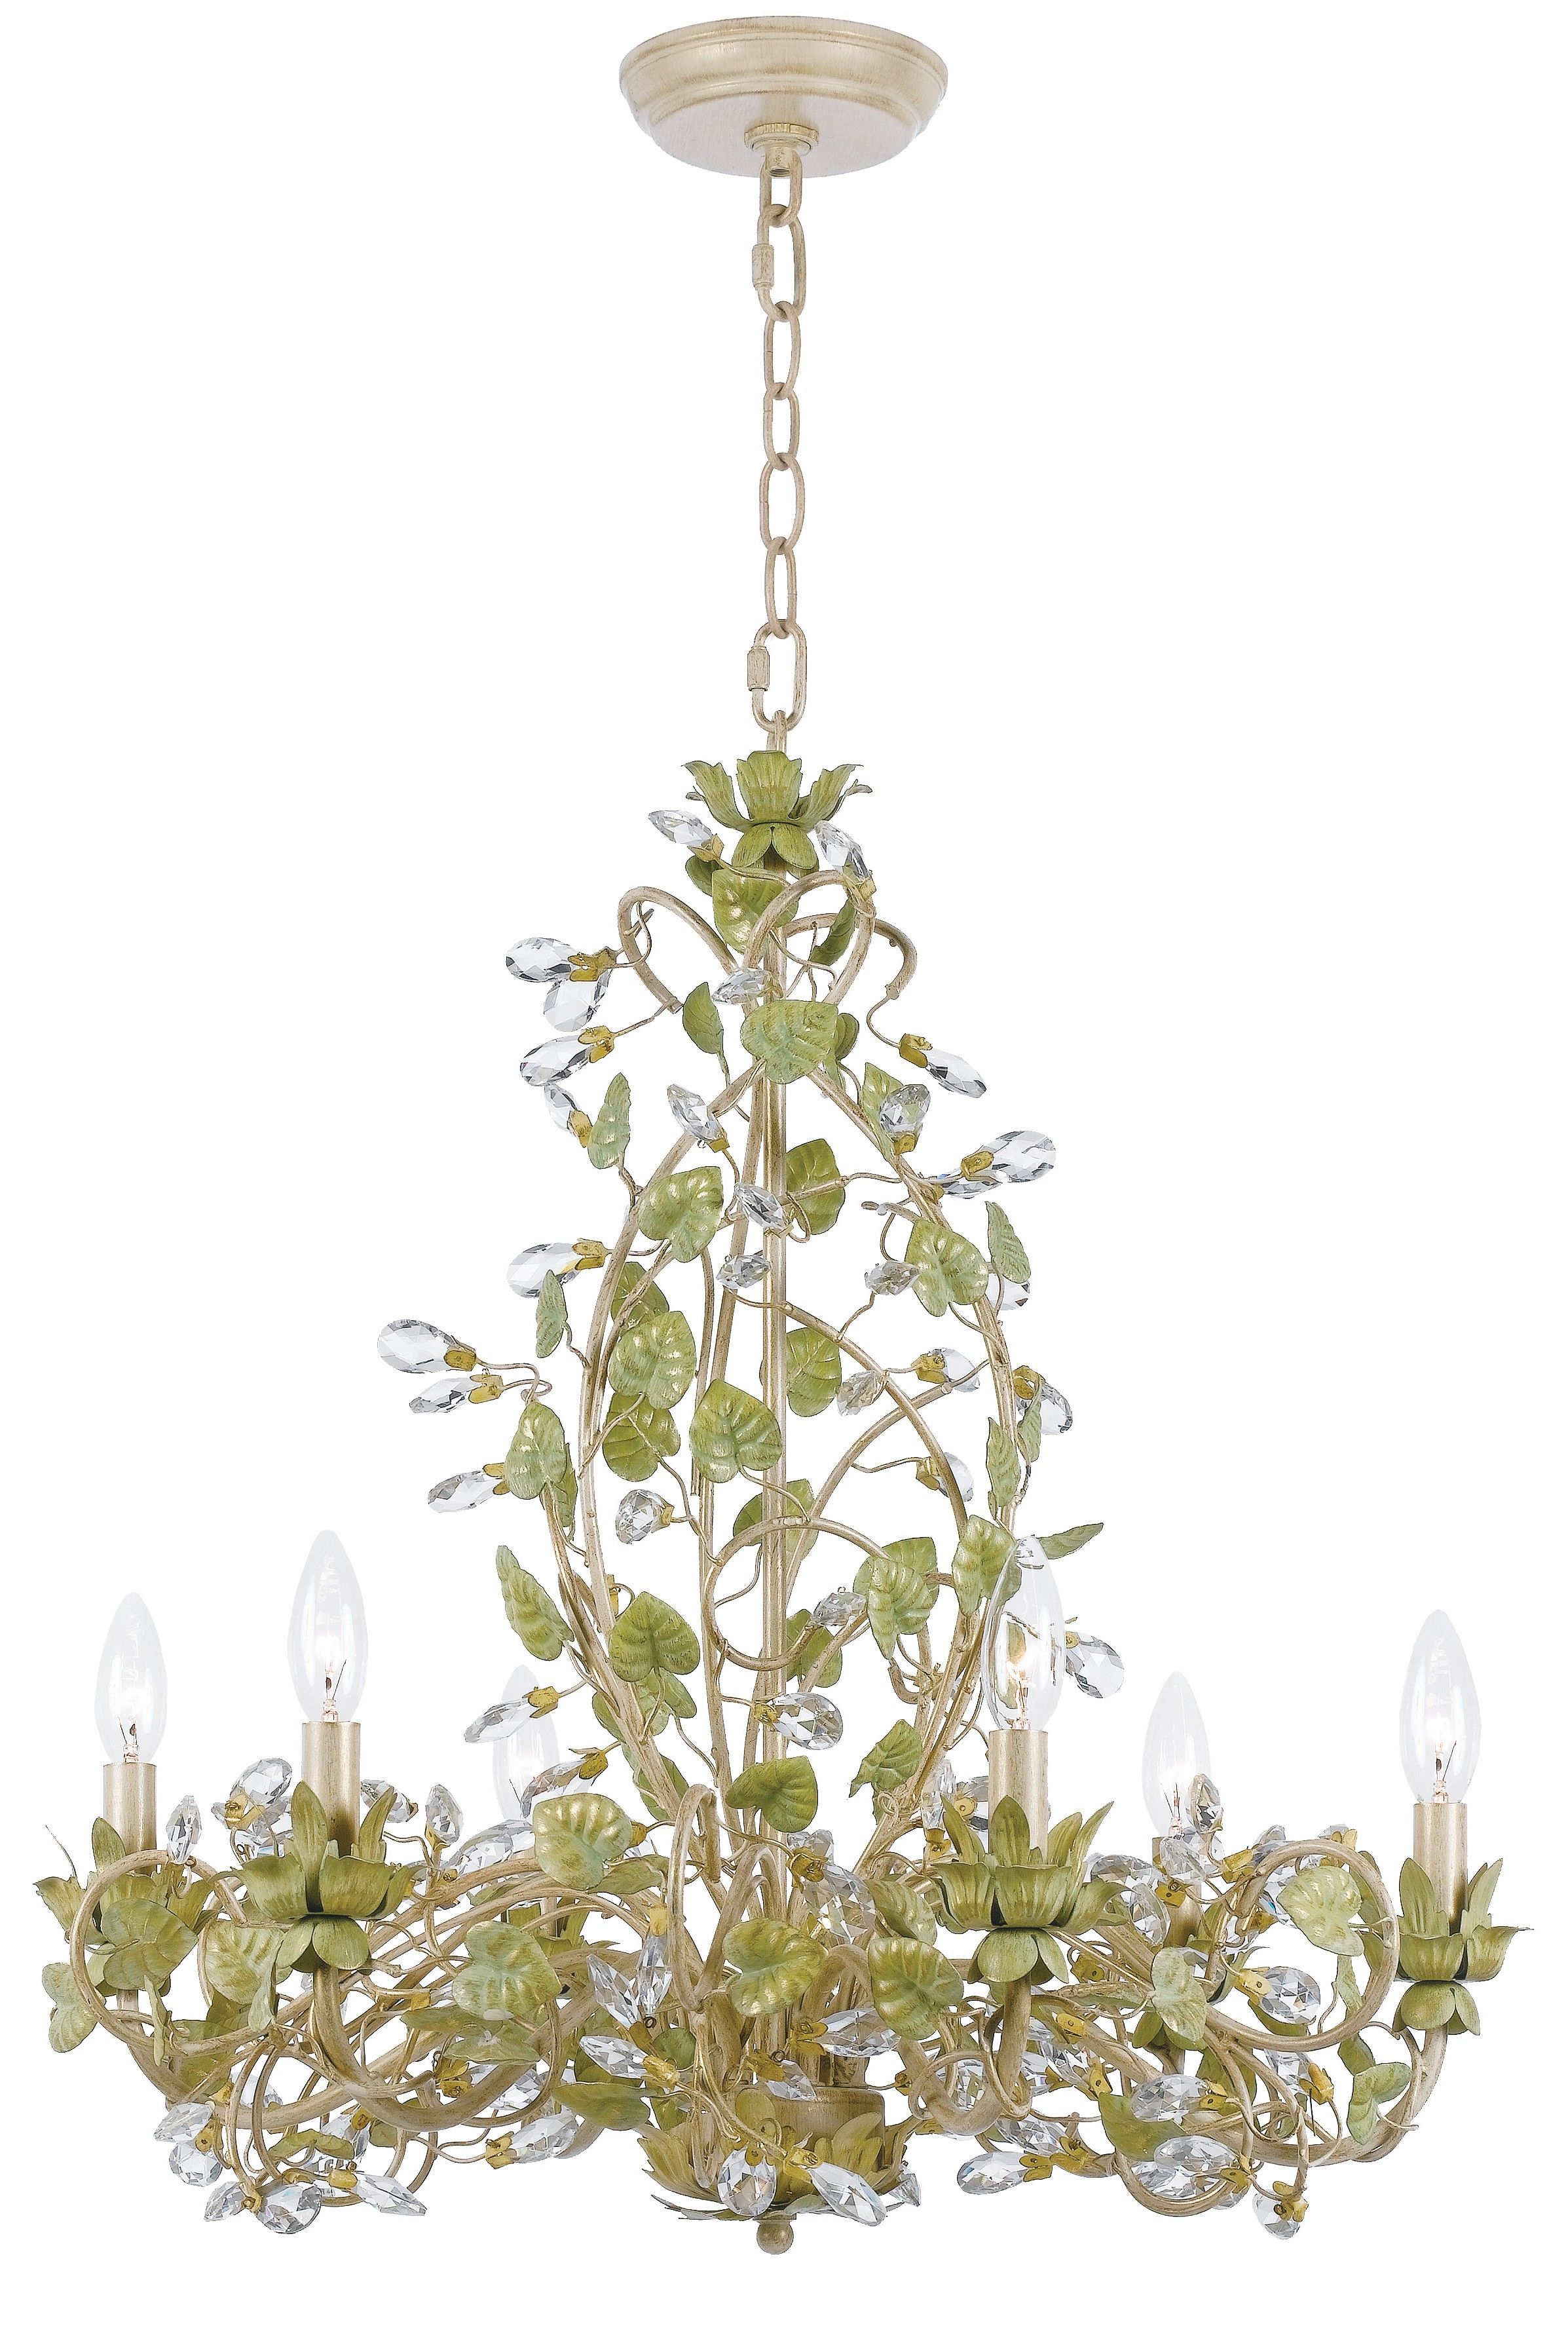 Crystorama josie 6light chandelier in champagne green tea